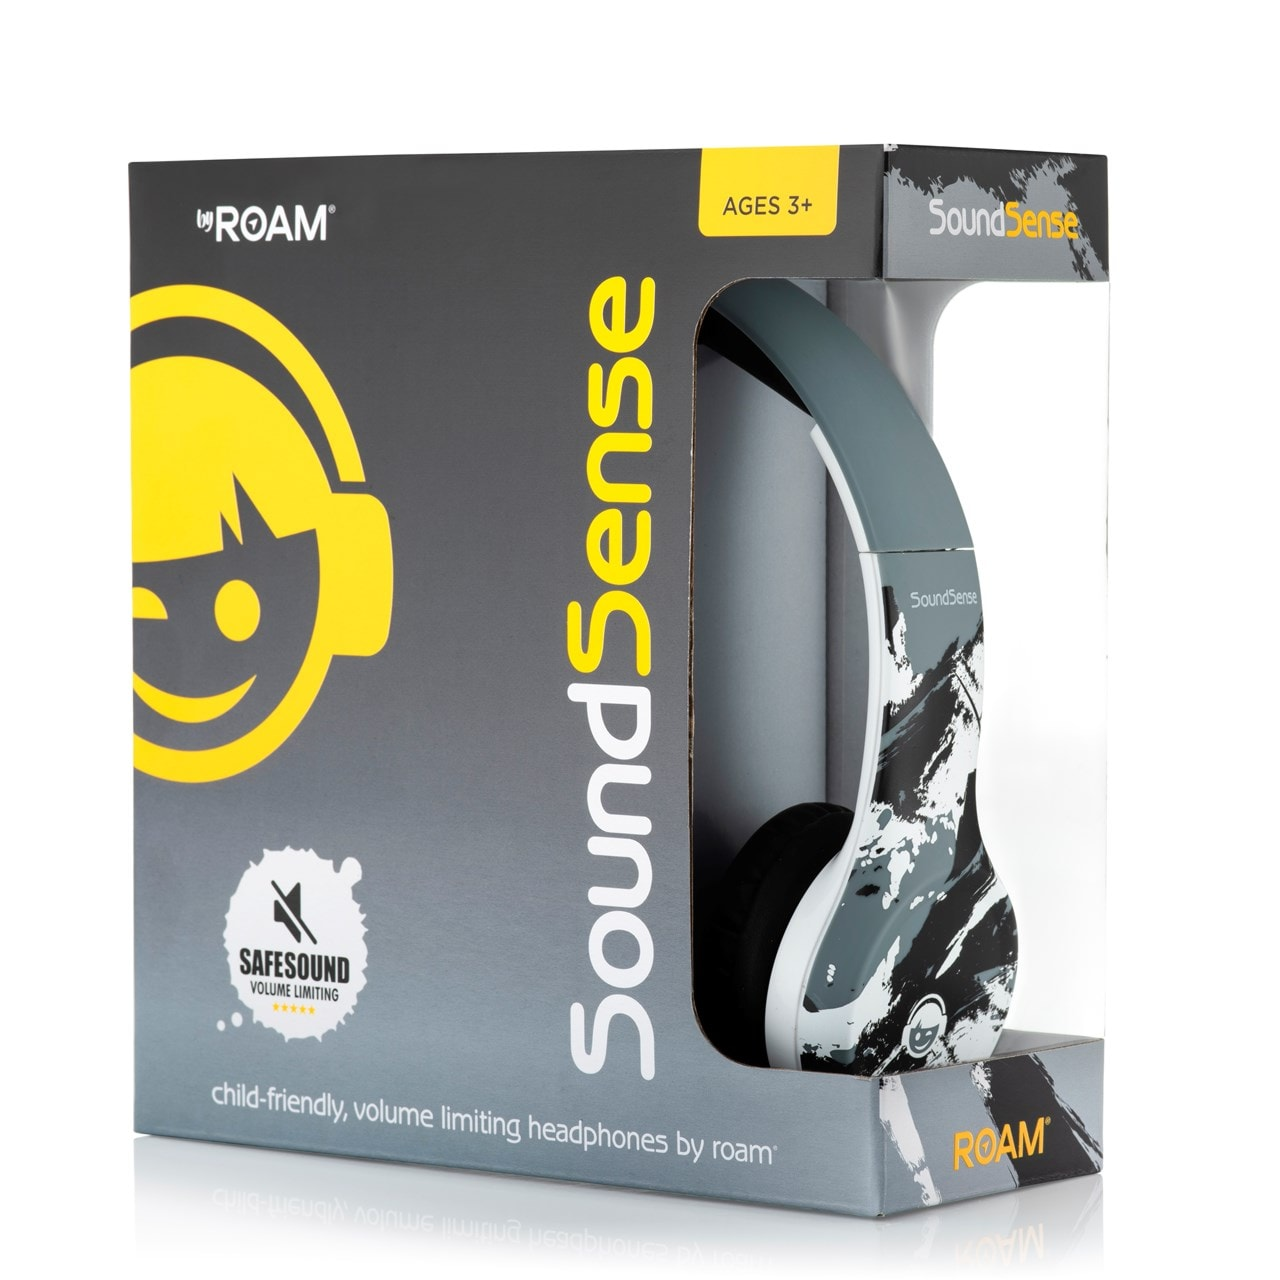 Roam Soundsense Grey Kids Headphones - 2